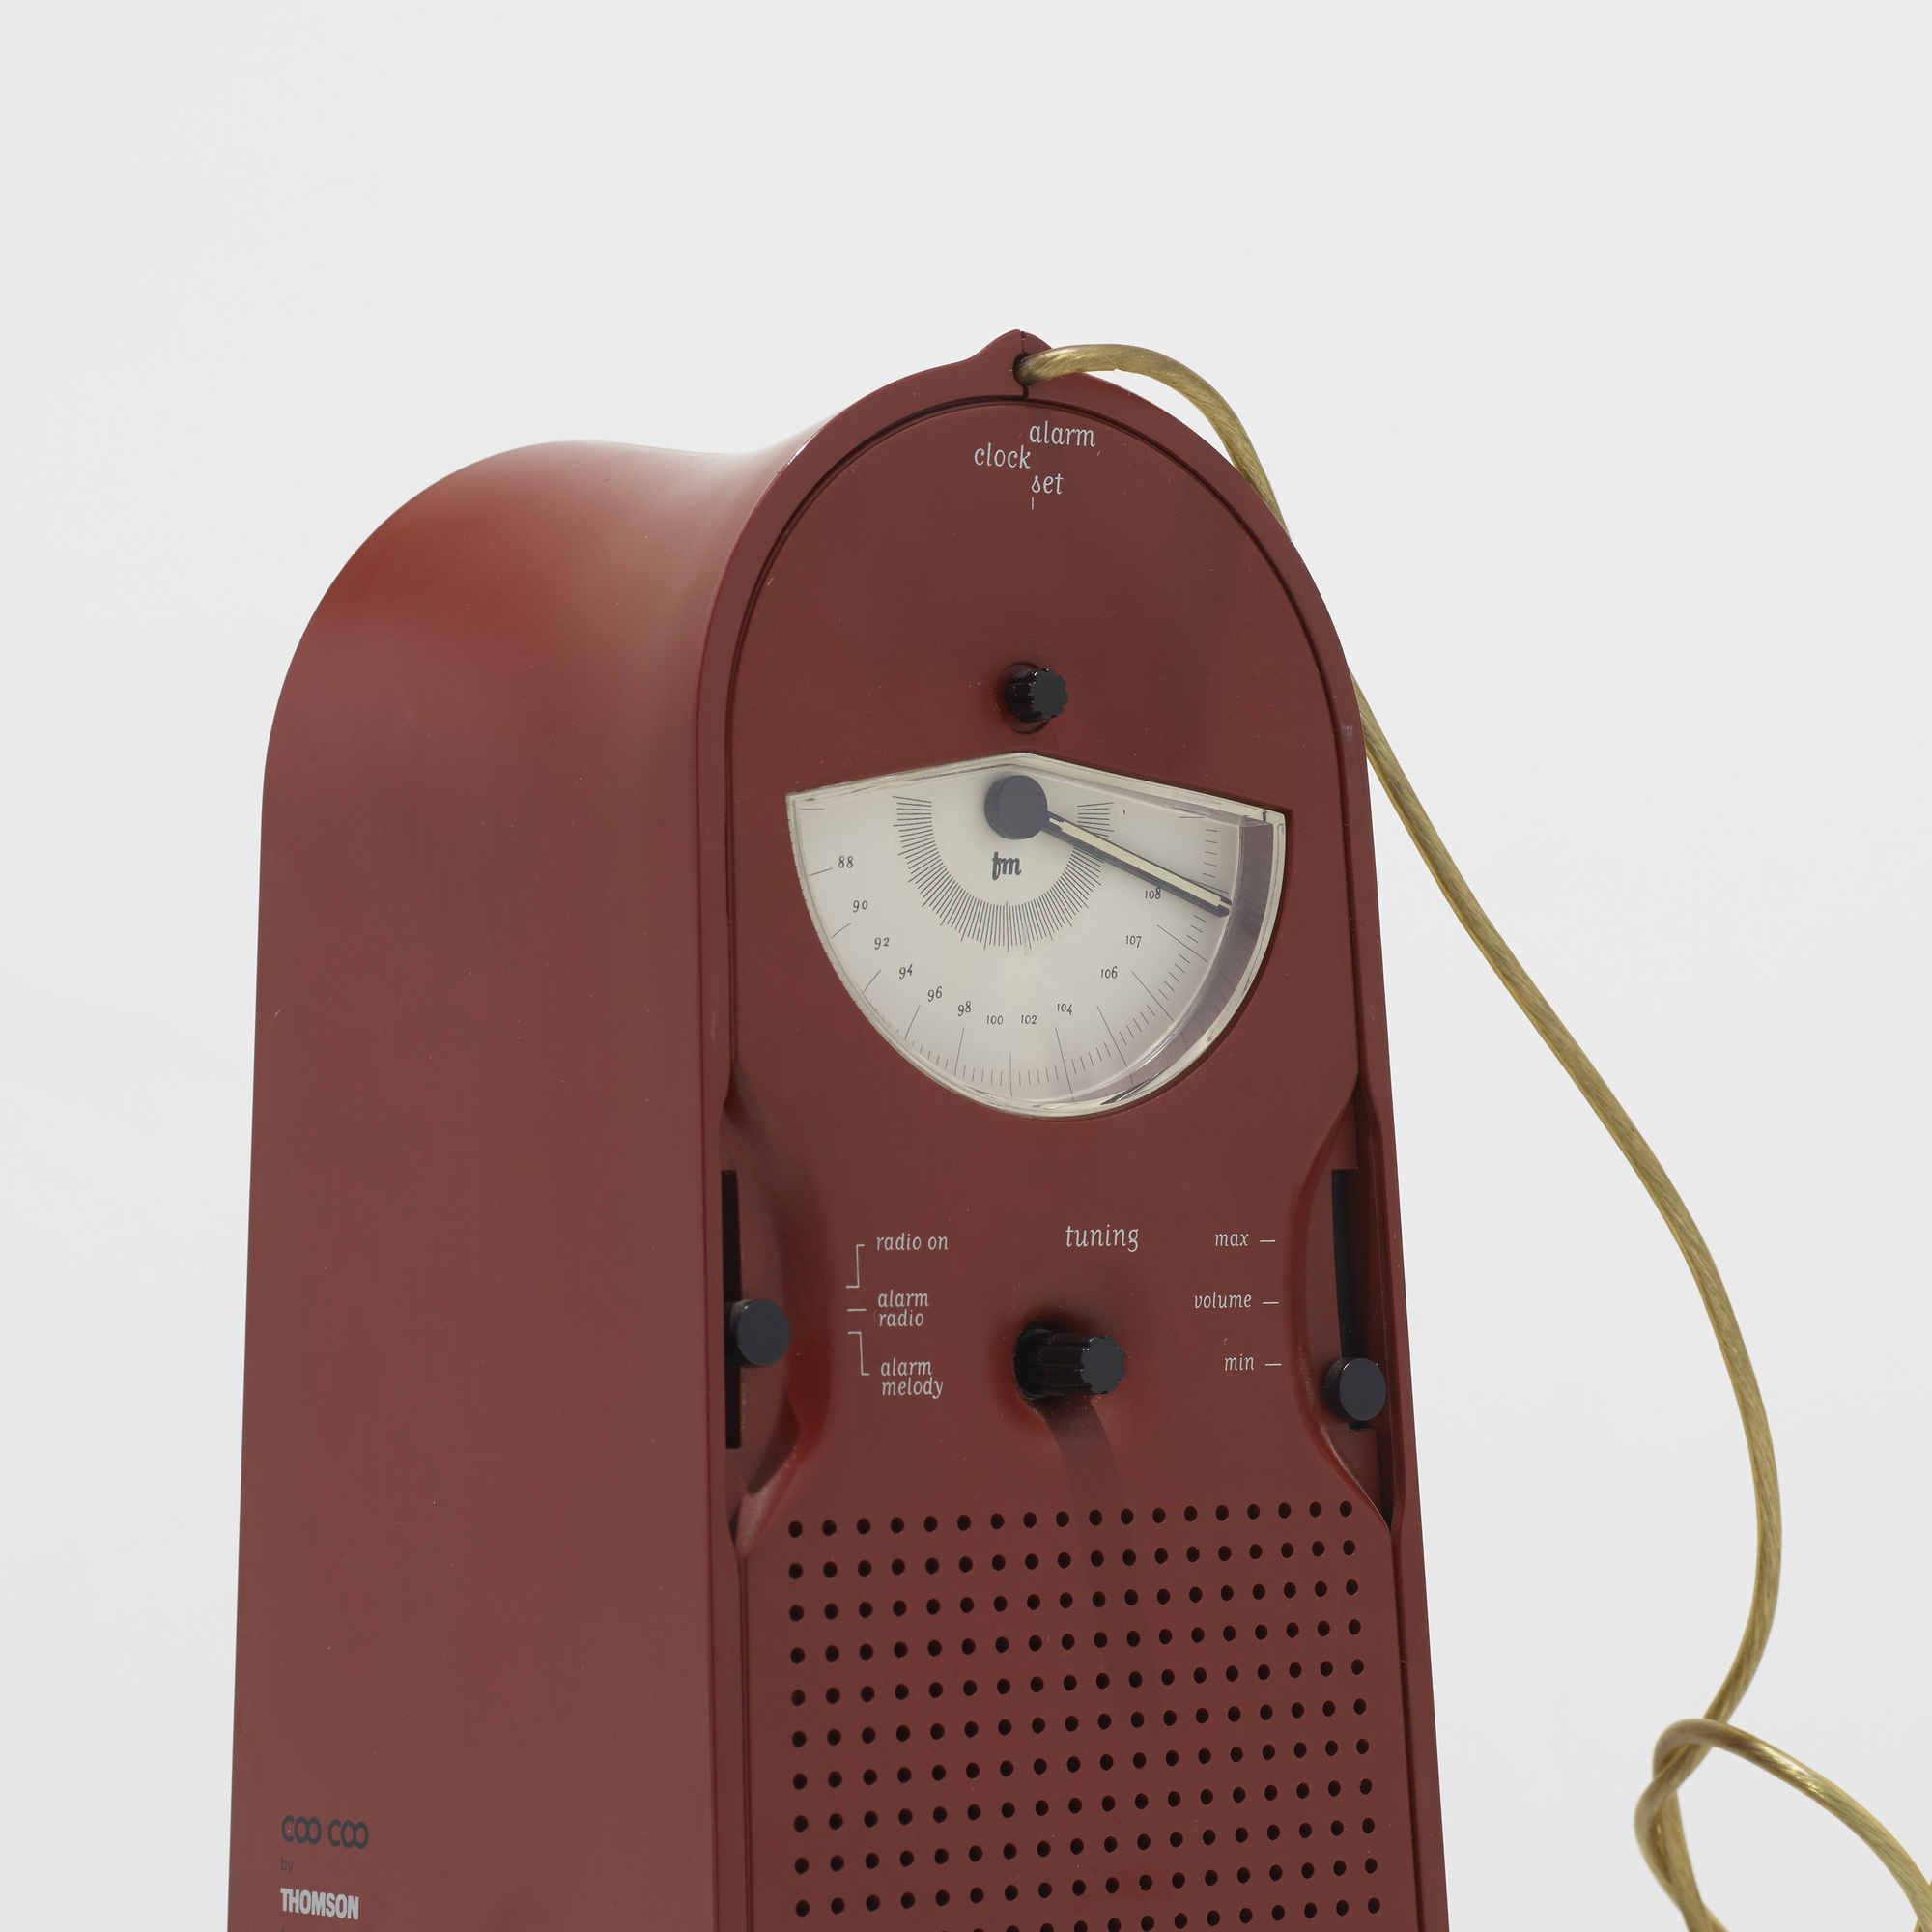 272: Philippe Starck / Coo Coo radio alarm clock (3 of 3)